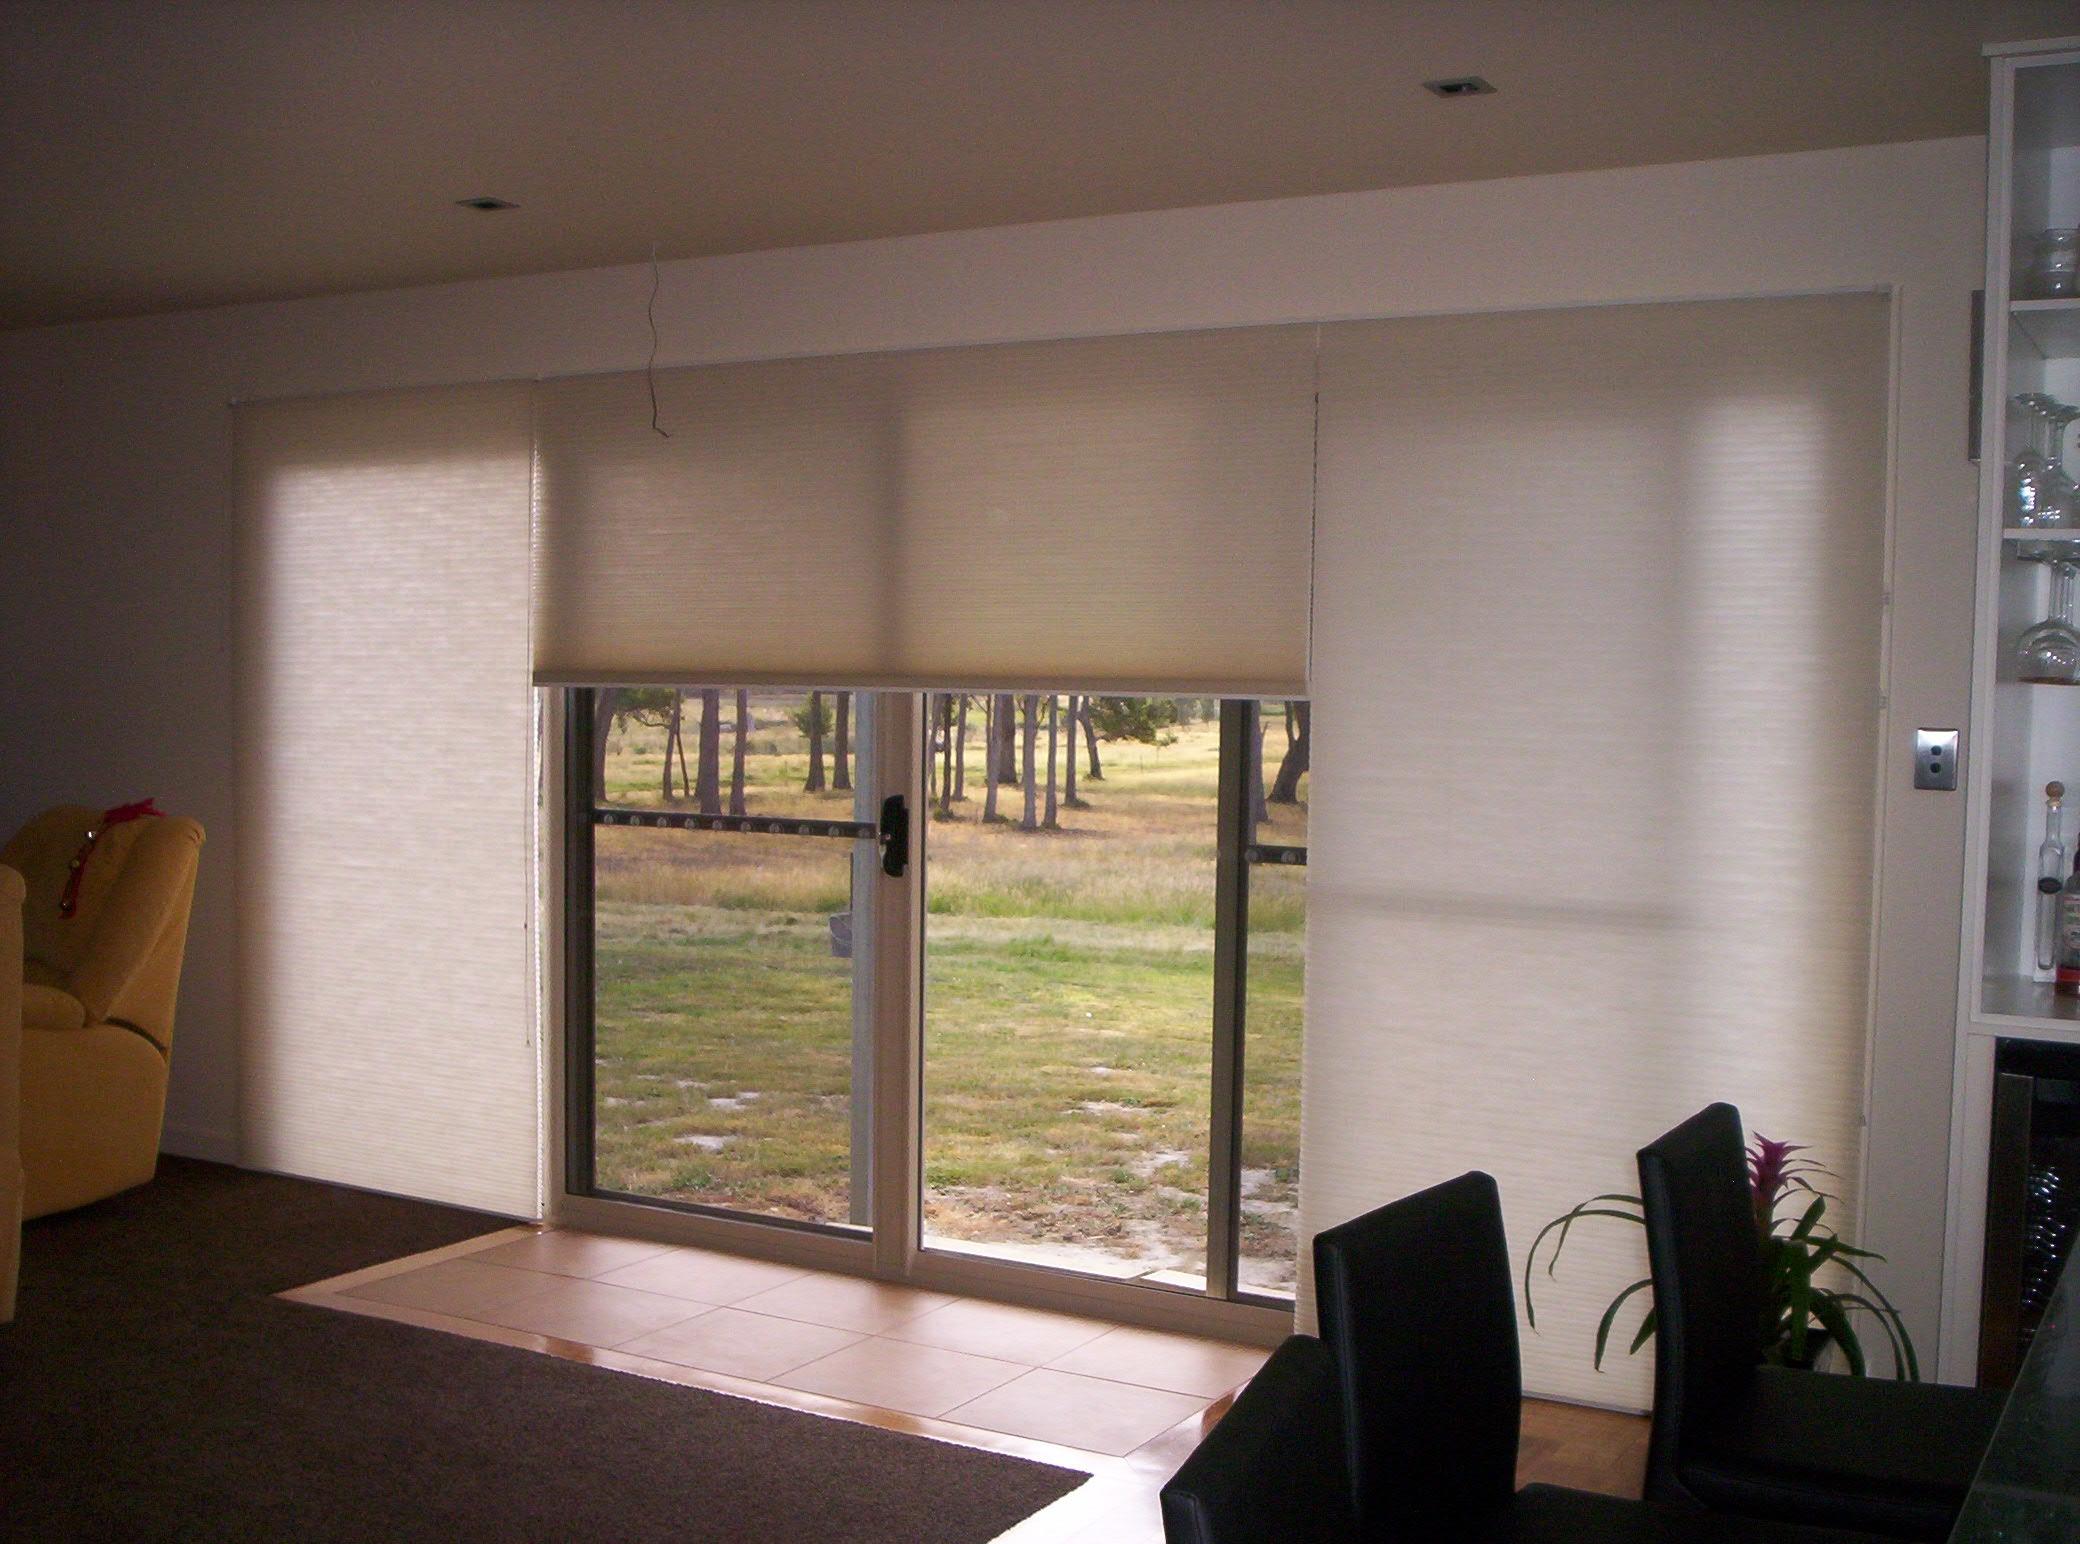 Solar Screens For Sliding Patio Doorssolar shades the shade factory sliding door sliding doors